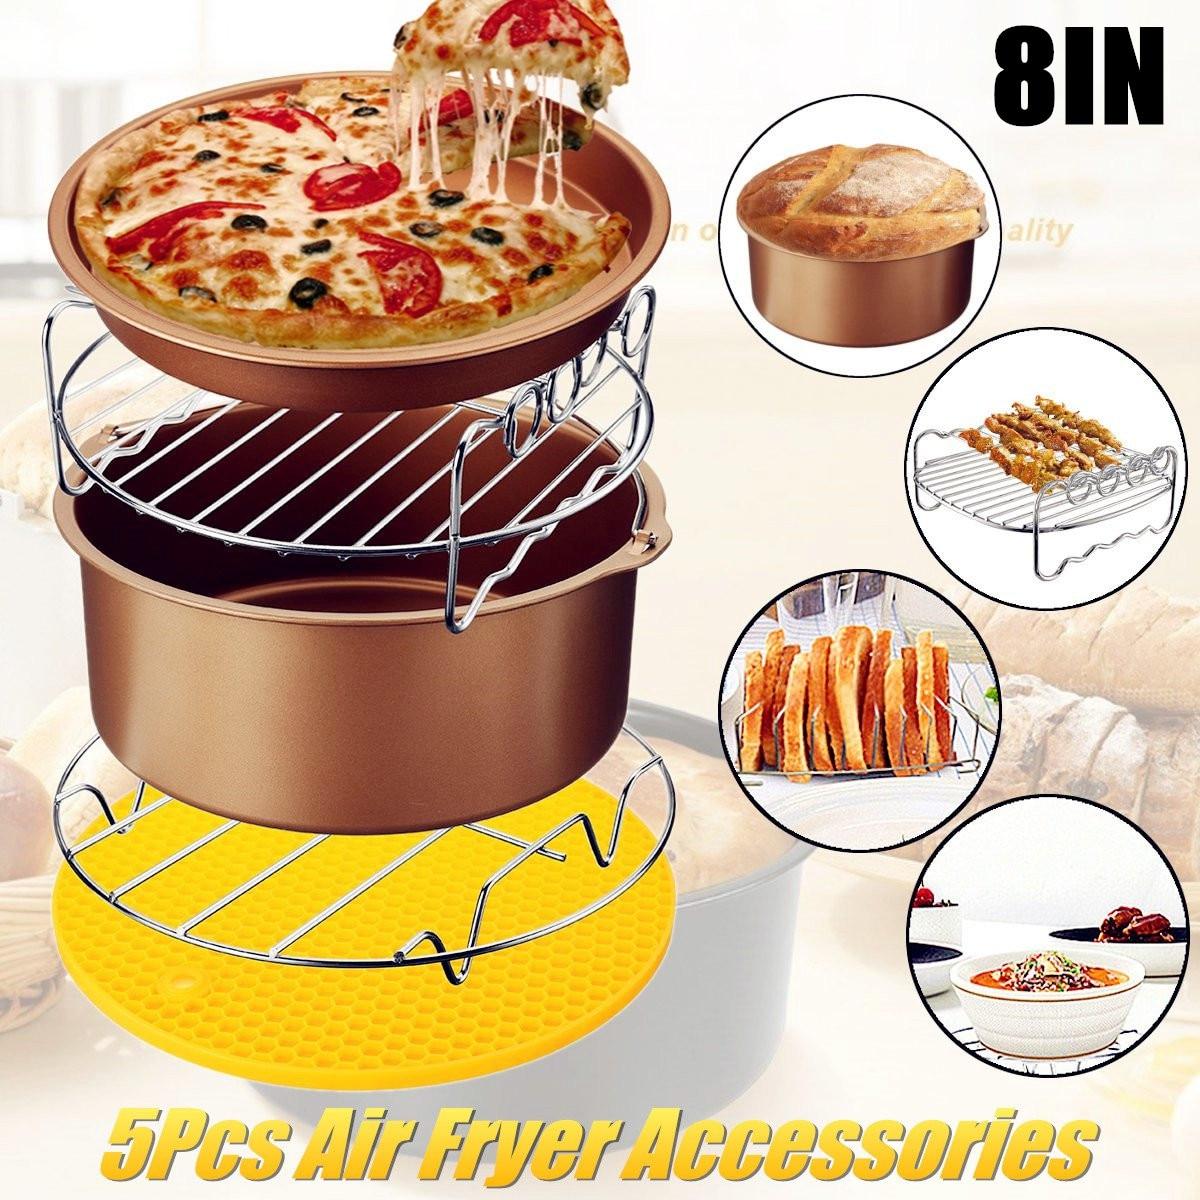 5 pz/set 8 pollice Aria di Frittura Pan Accessori Friggitrice di Cottura Cestino Piastra Pizza Griglia Pentola Zerbino Multi-funzionale Cucina accessori Hot